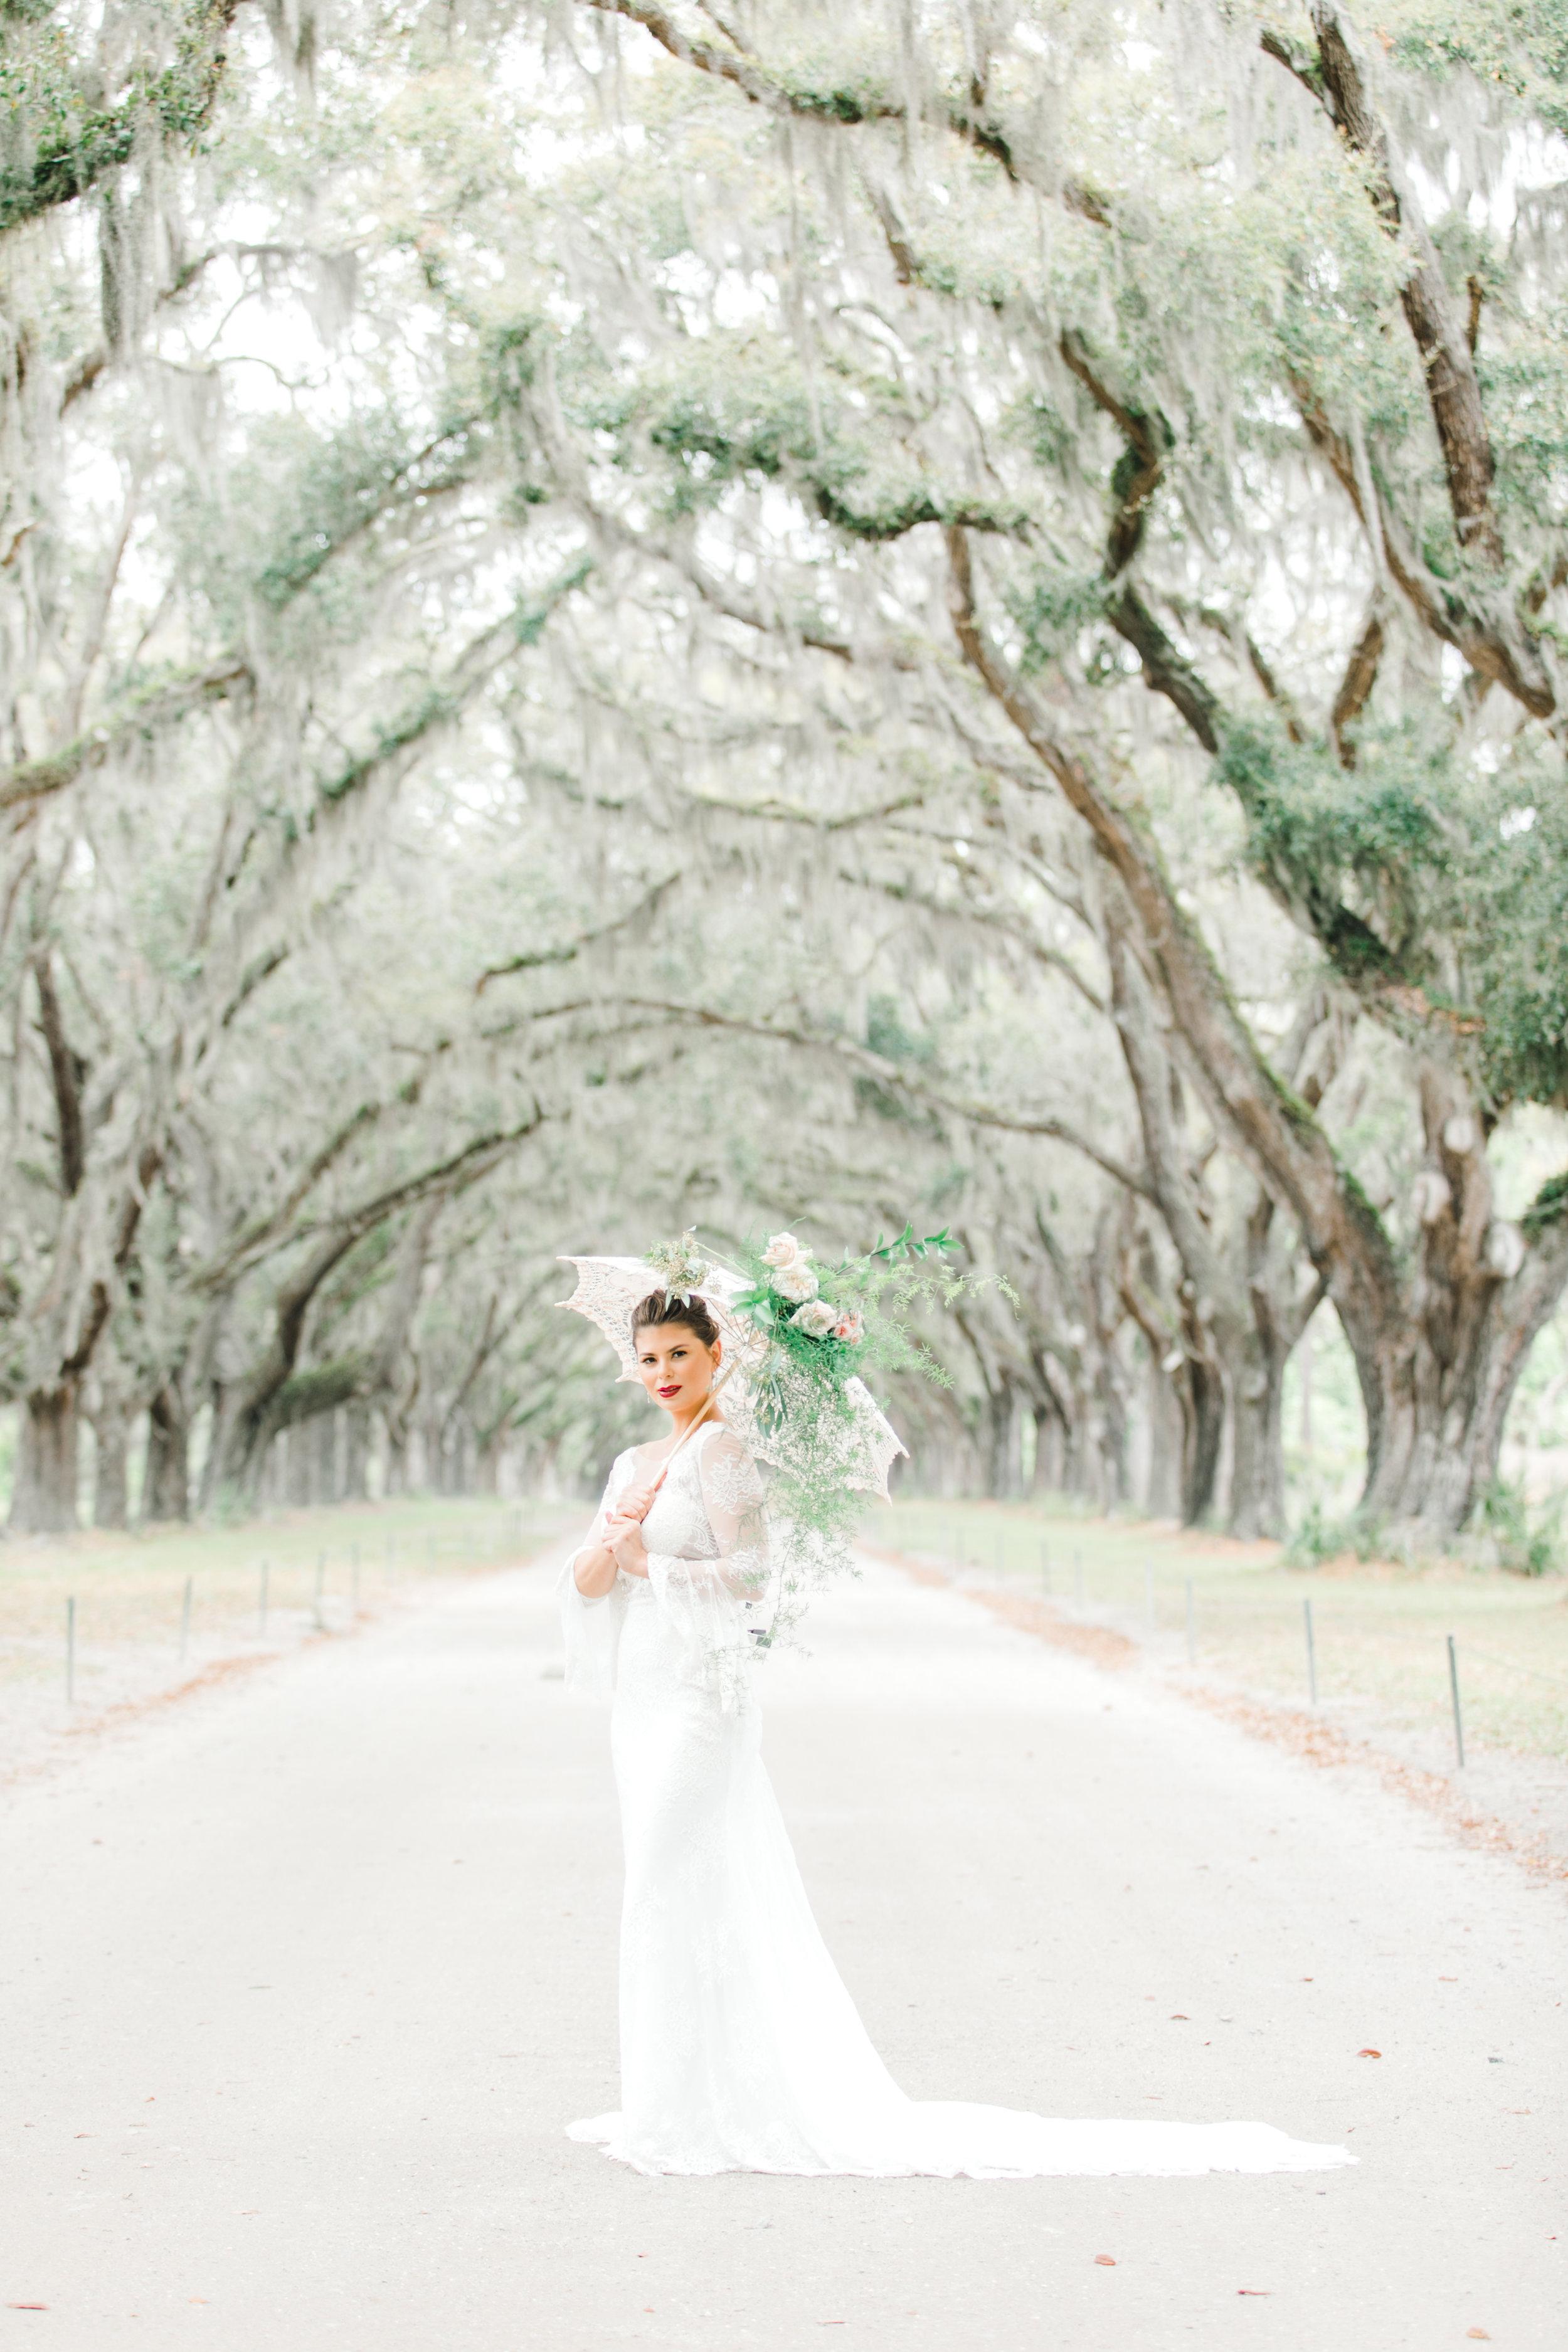 lamour-by-calla-blanche-amber-long-sleeve-wedding-dress-wormsloe-wedding-elopement-wormsloe-wedding-inspiration-ivory-and-beau-savannah-wedding-dresses-savannah-bridal-boutique-Selyciayangphotograpy-44.jpg